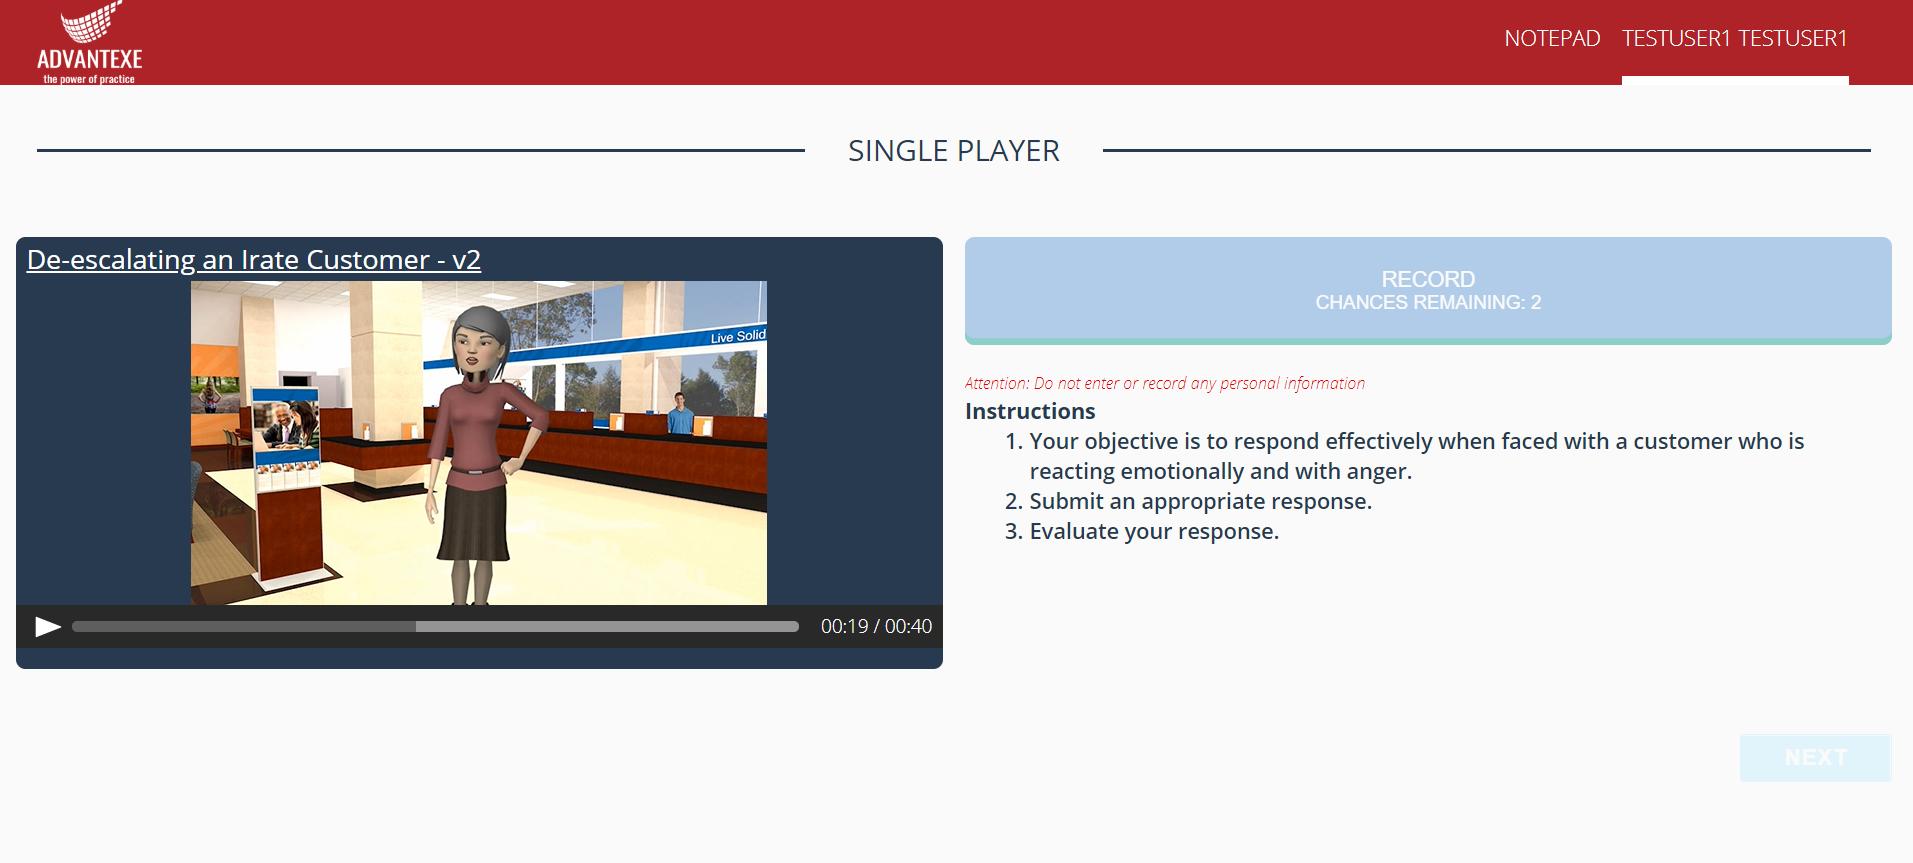 single-player-screen-praction